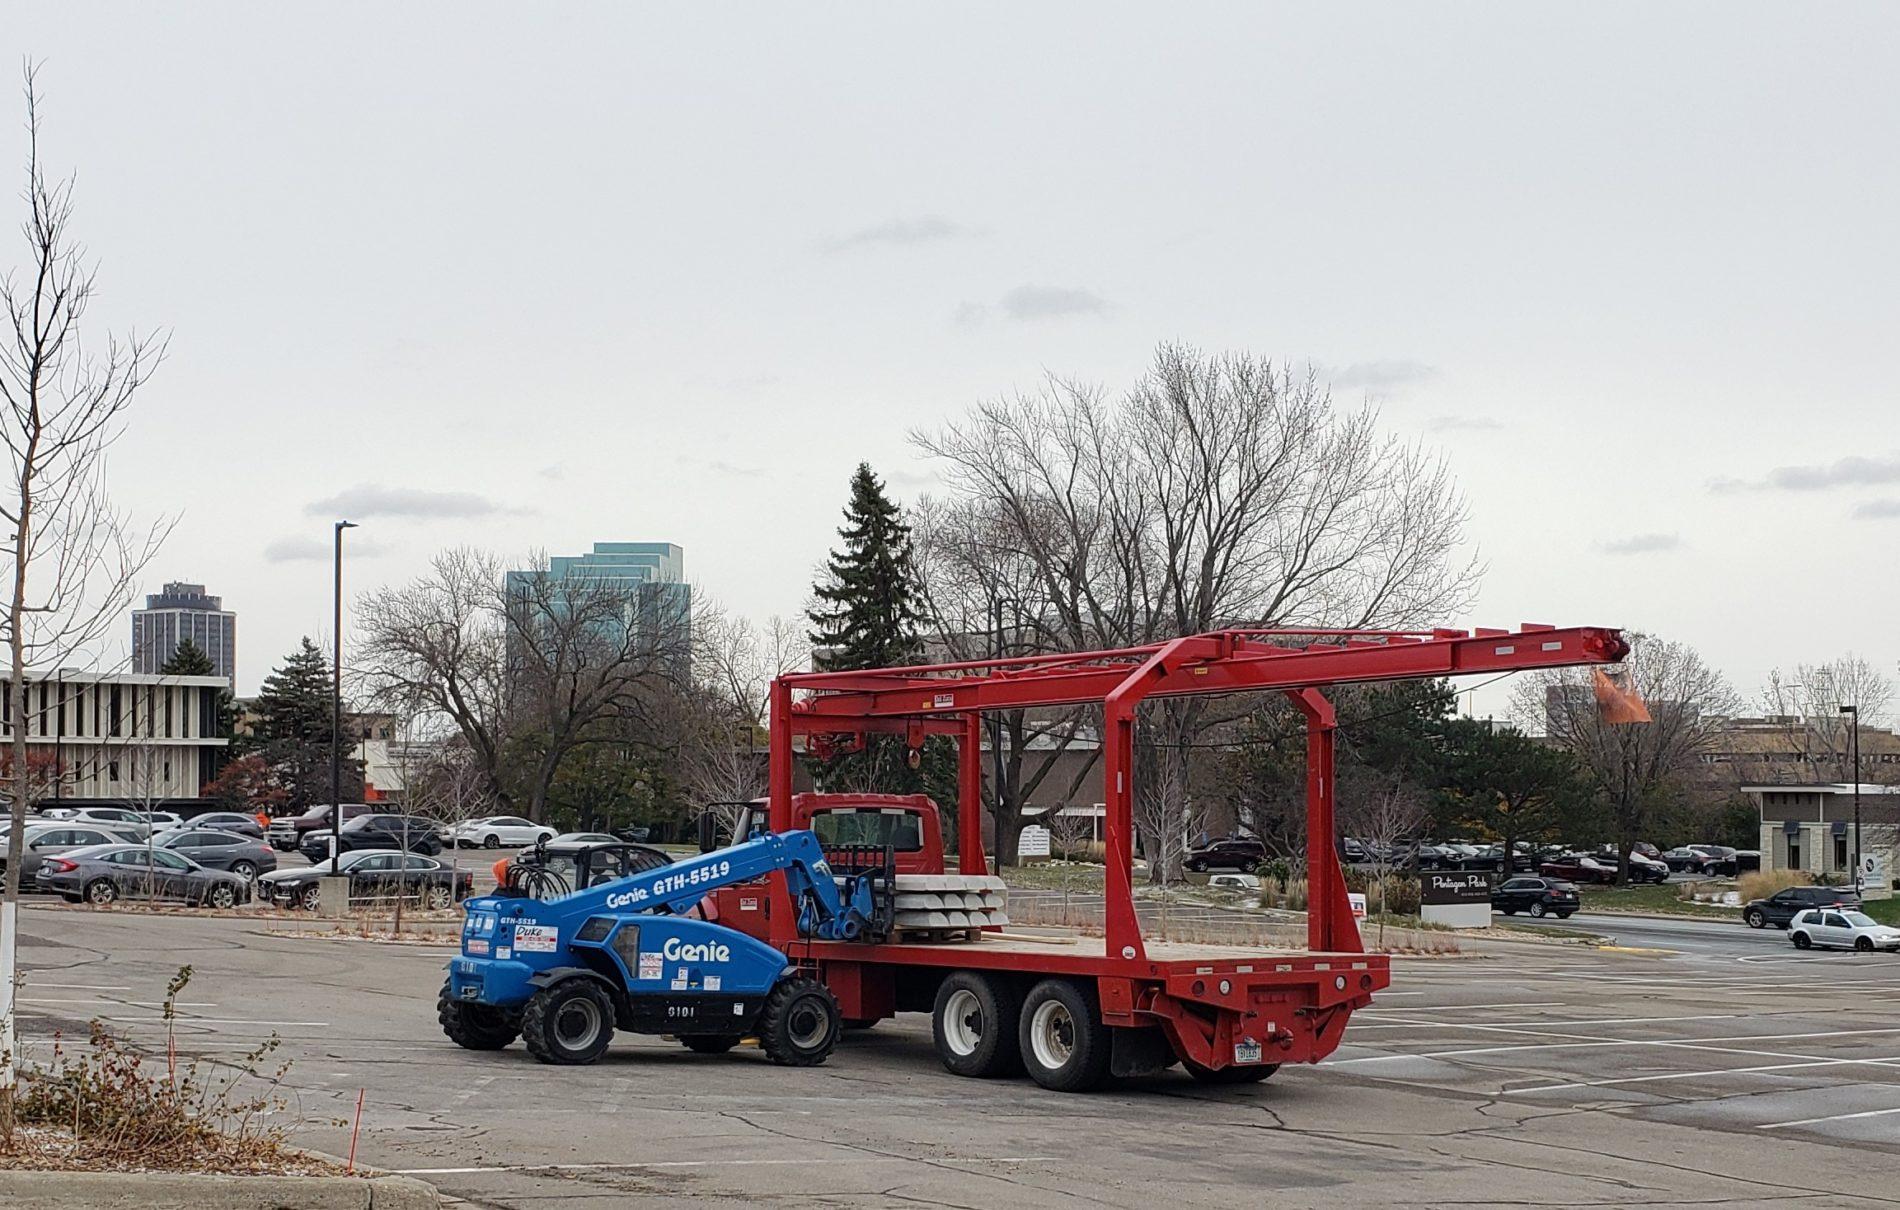 Unloading Parking Curbs